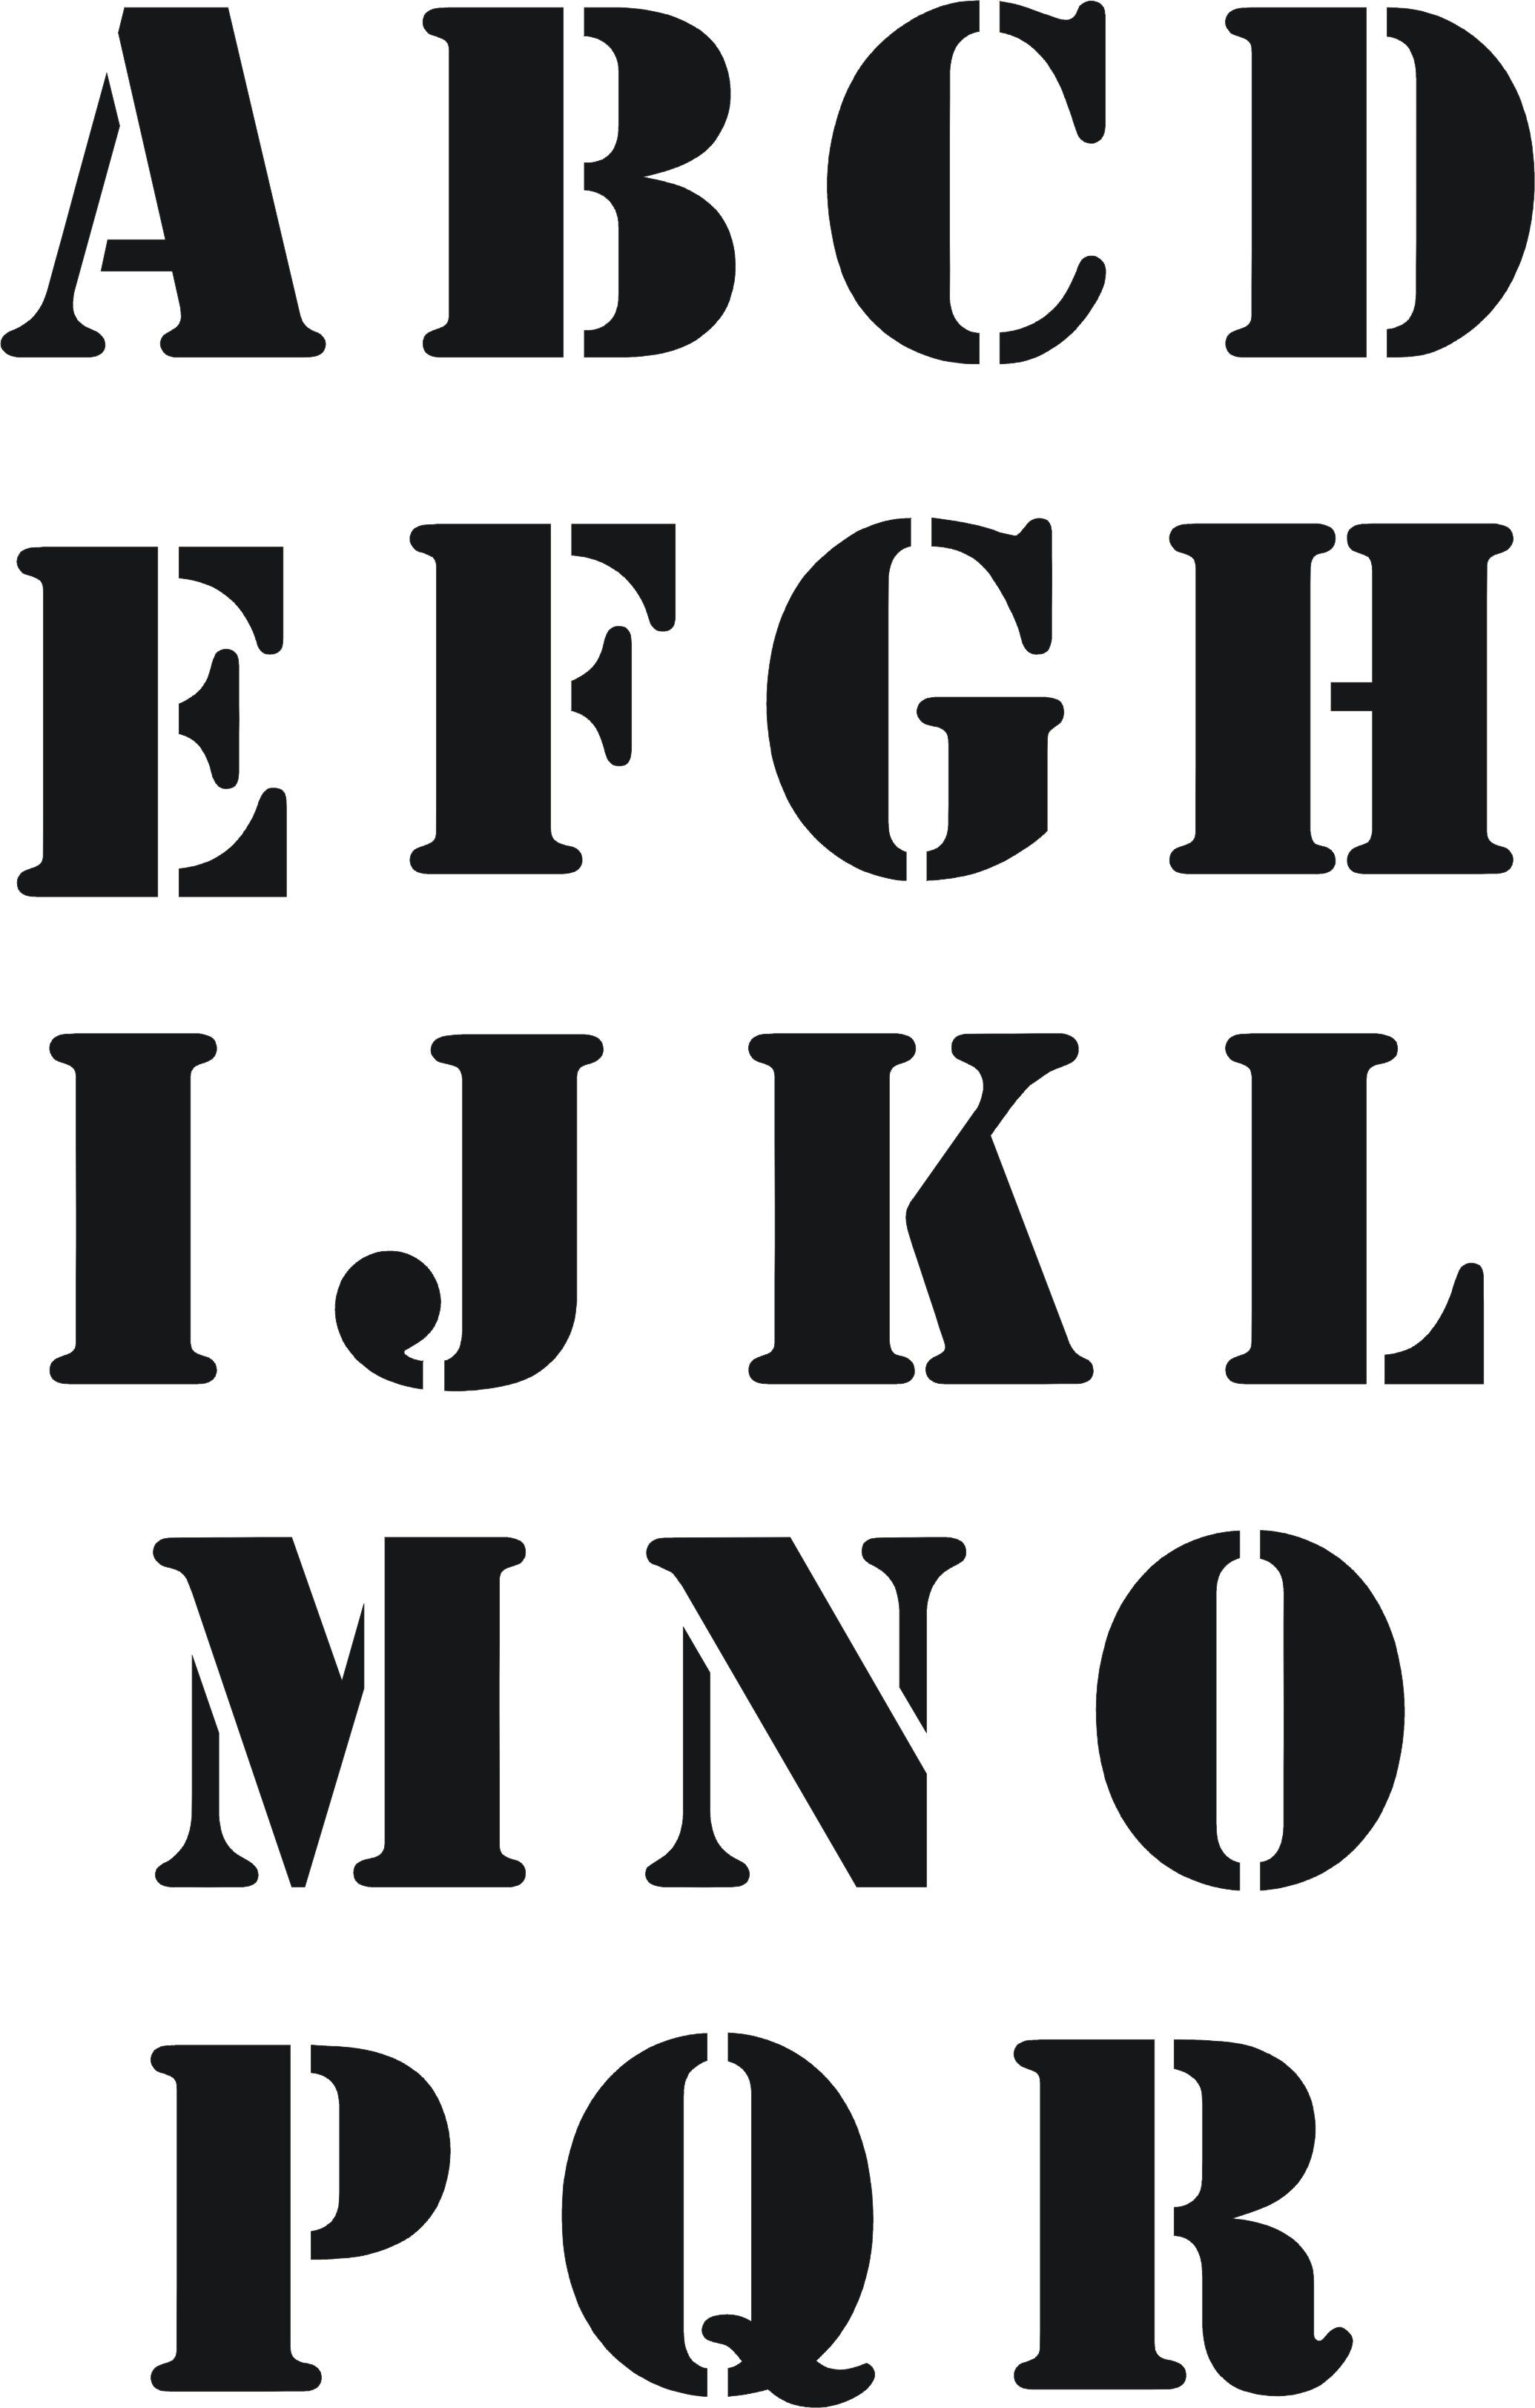 Eigenmarke Stencil Schablone Abc 2Tlg. | Plantillas De destiné Police Ecriture Noel